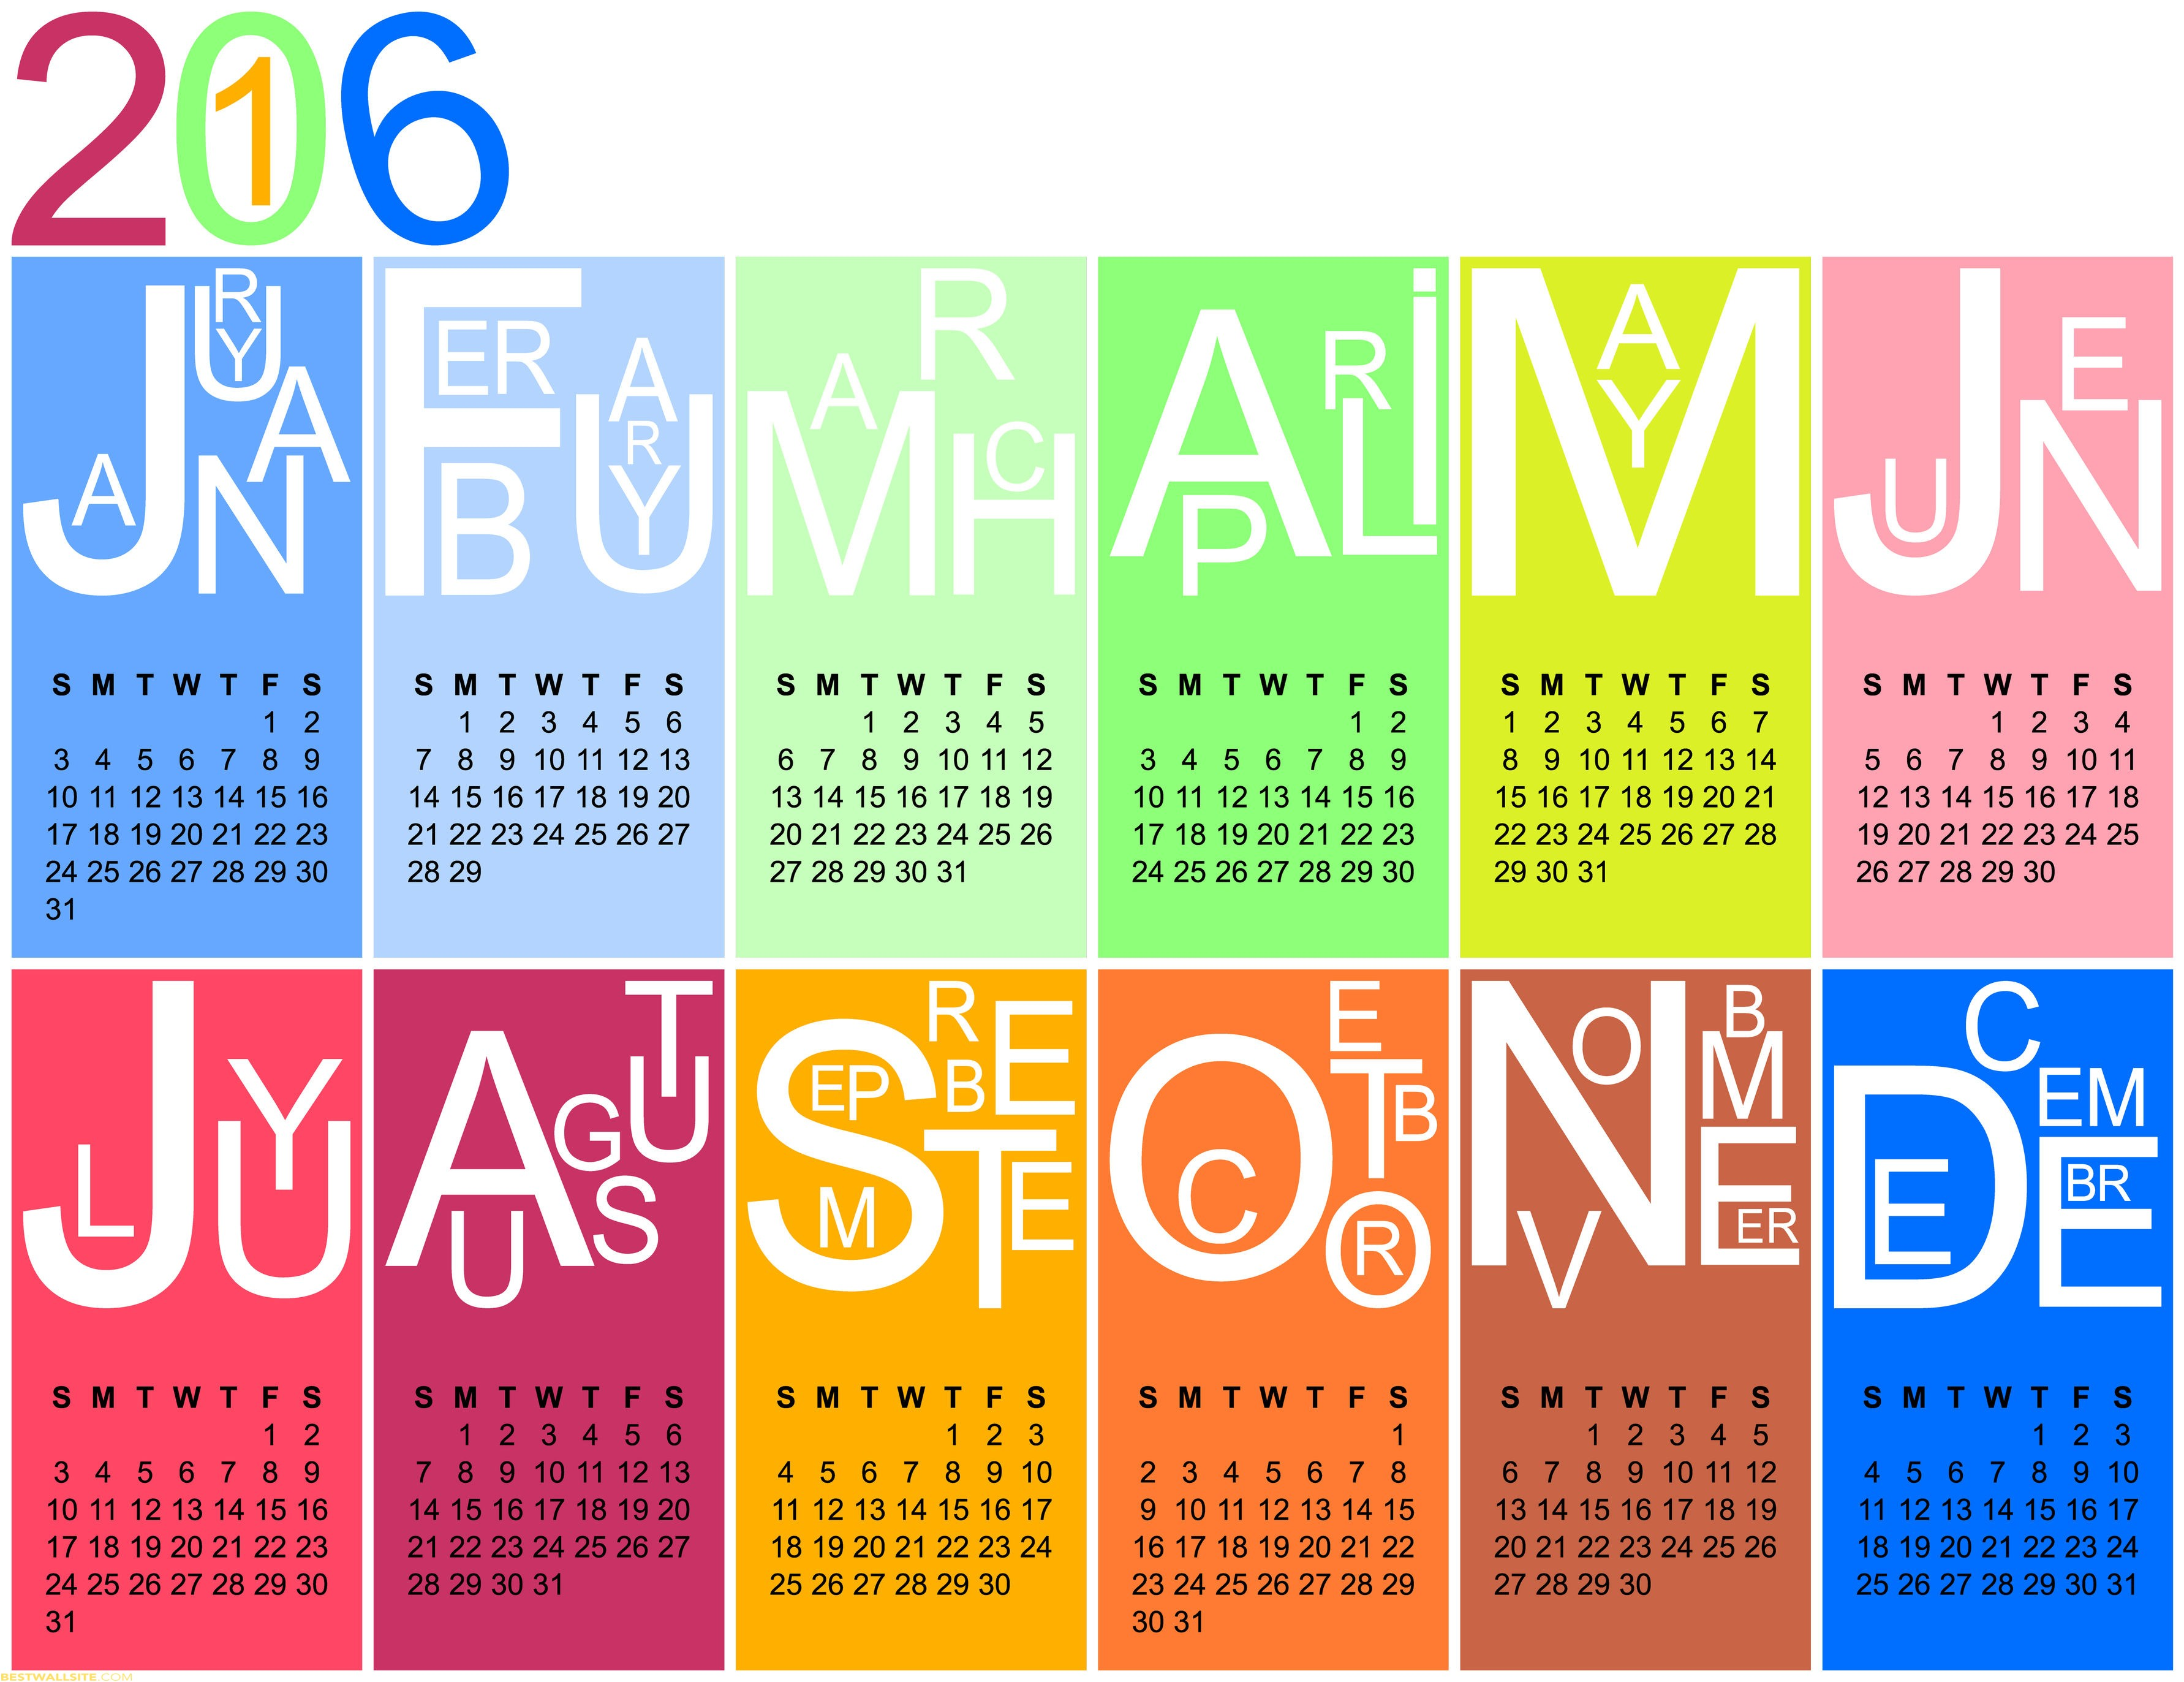 2016 Wall Calendar Colour FULL HD BestWallSitecom 3565x2745